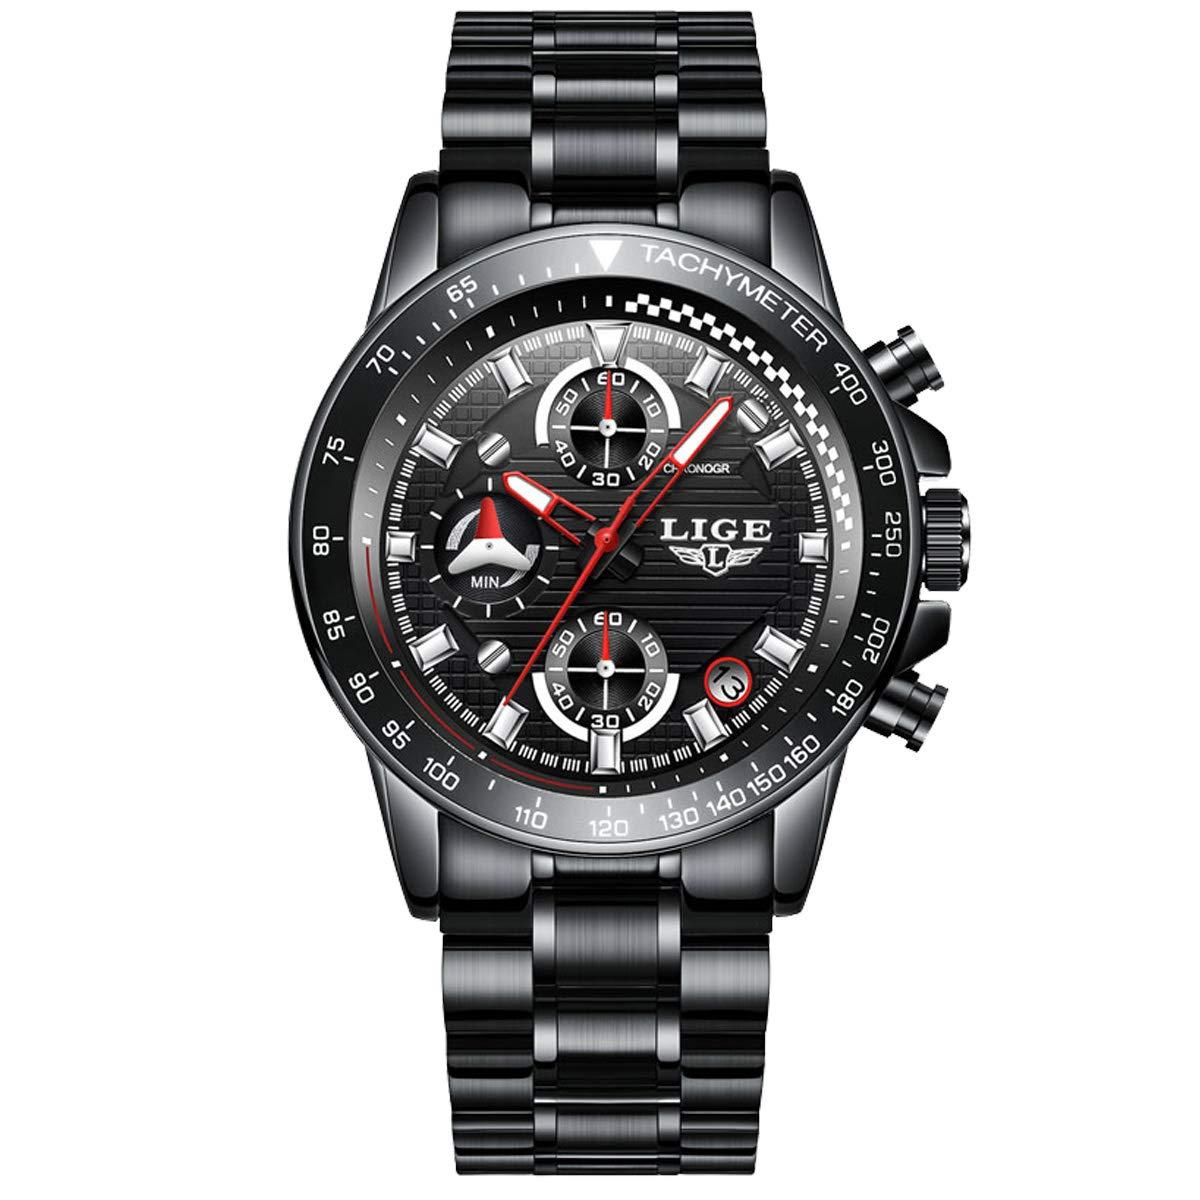 Watches Mens Steel Band Quartz Analog Wrist Watch with Chronograph Waterproof Sports Black Watch